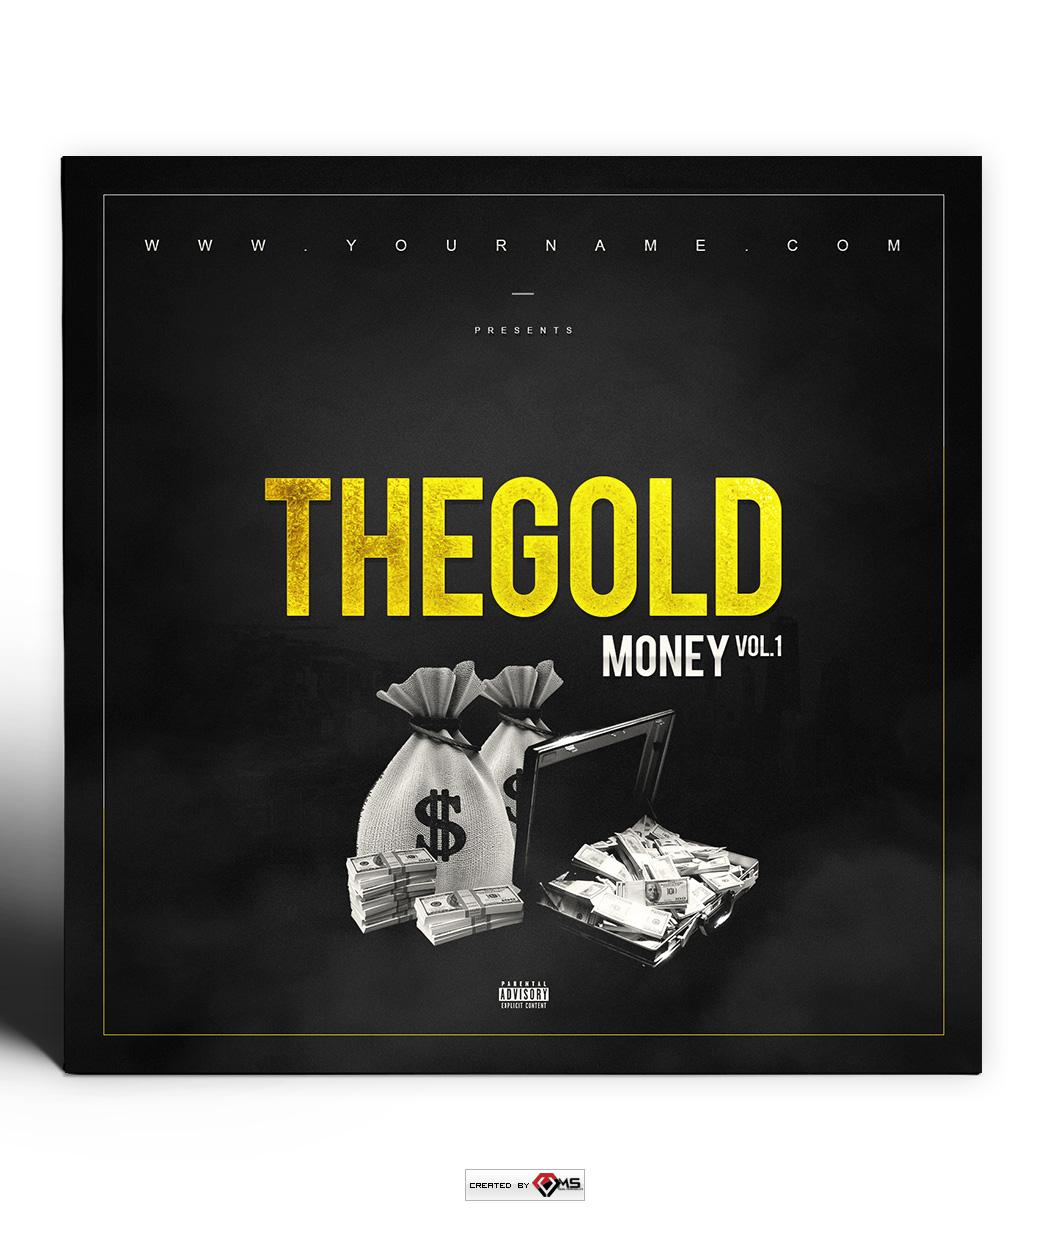 Gold Money Mixtape Cover Template Vms